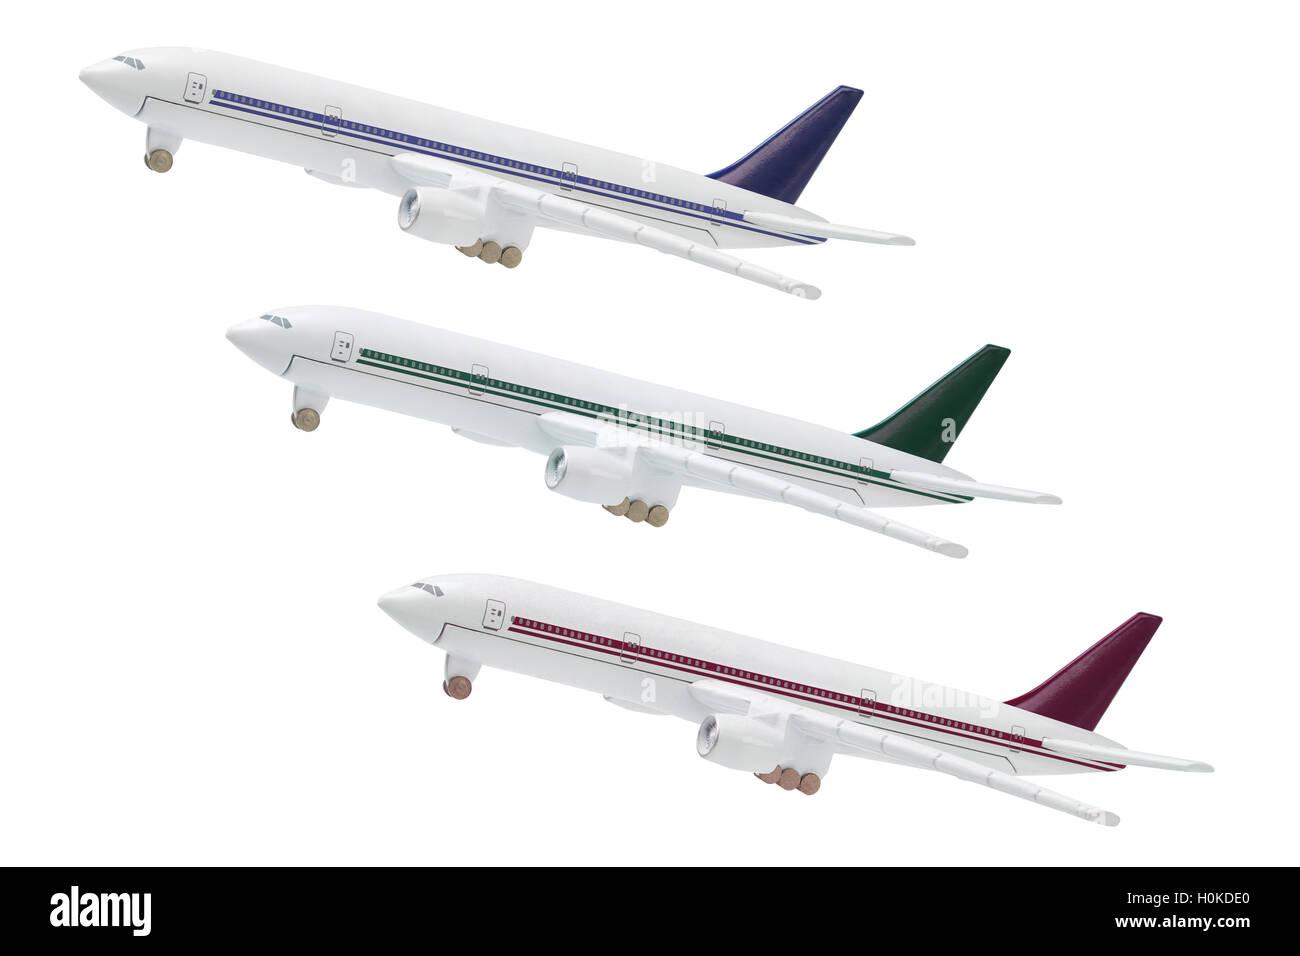 Miniatue Model Of Commercial Jetliners on white Backgroud - Stock Image